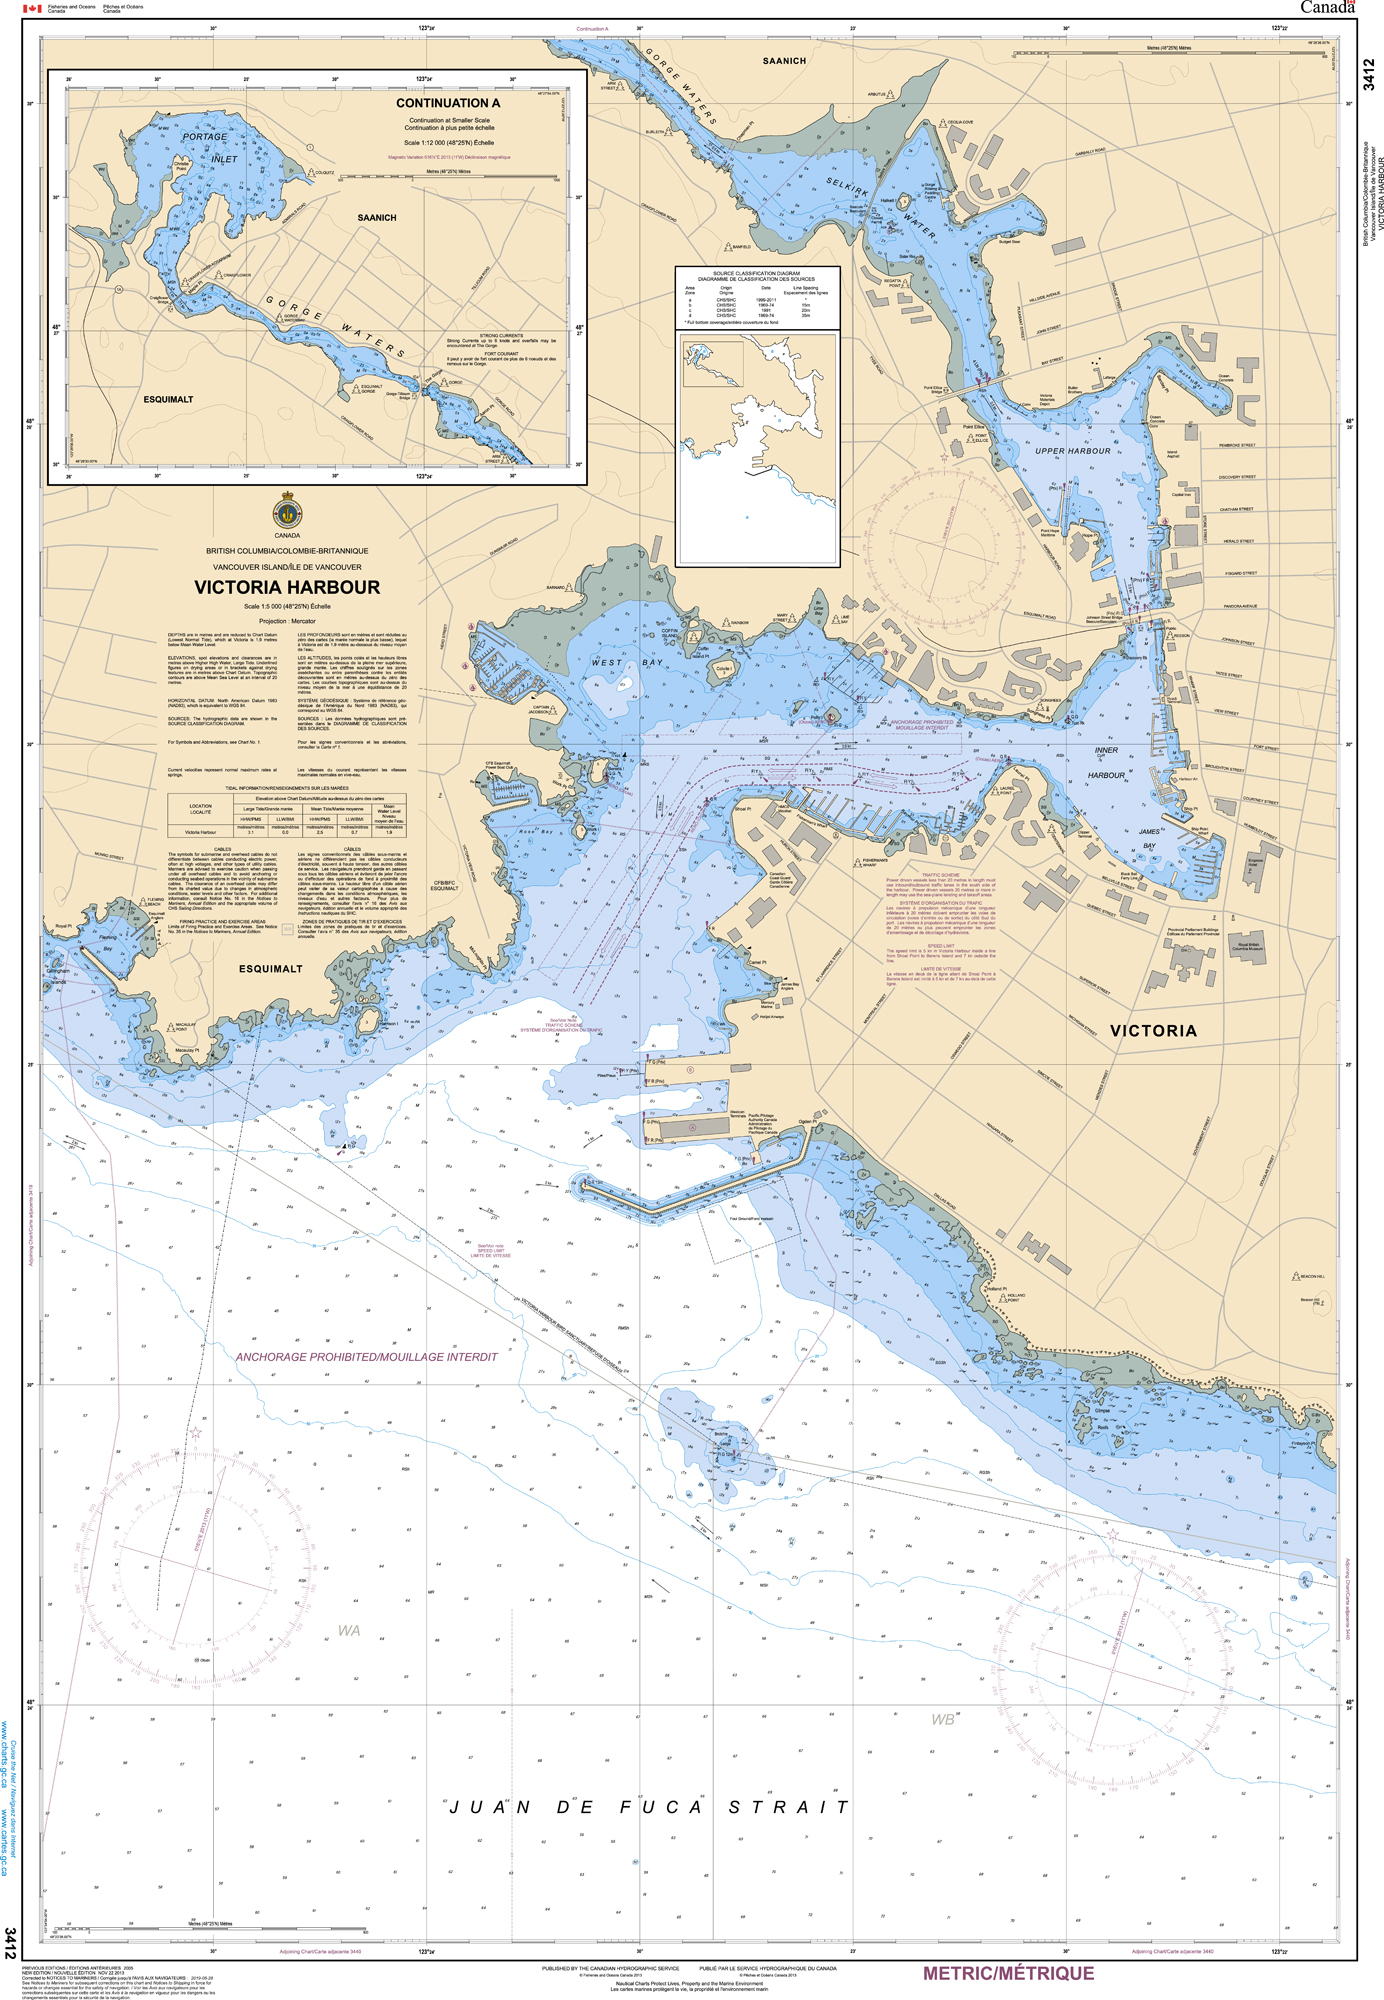 Pacific Region, CHS Chart 3412: Victoria Harbour